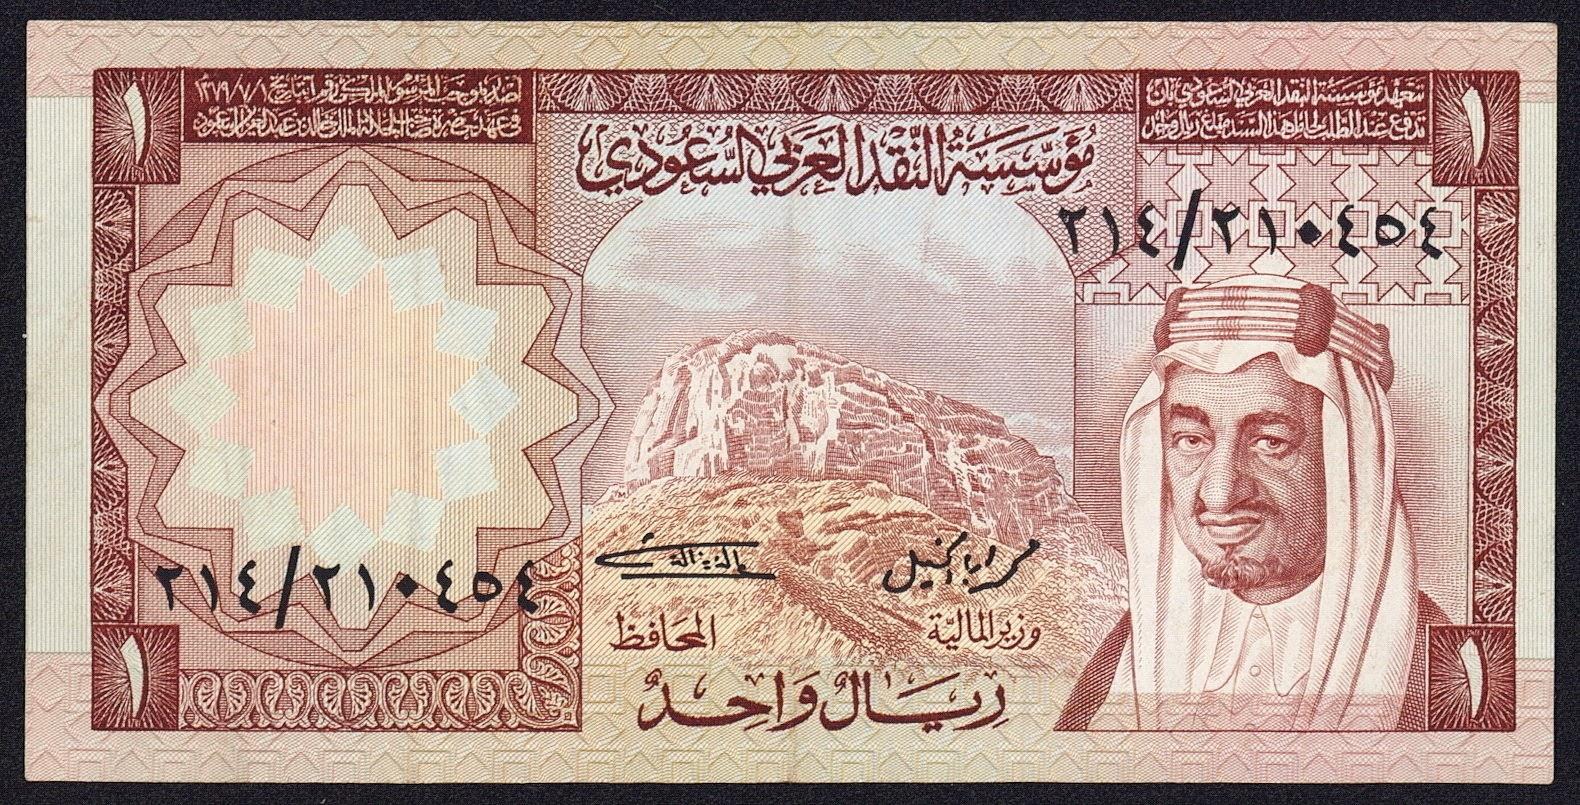 Saudi Arabia money currency One Saudi Riyal Note 1976 King Faisal